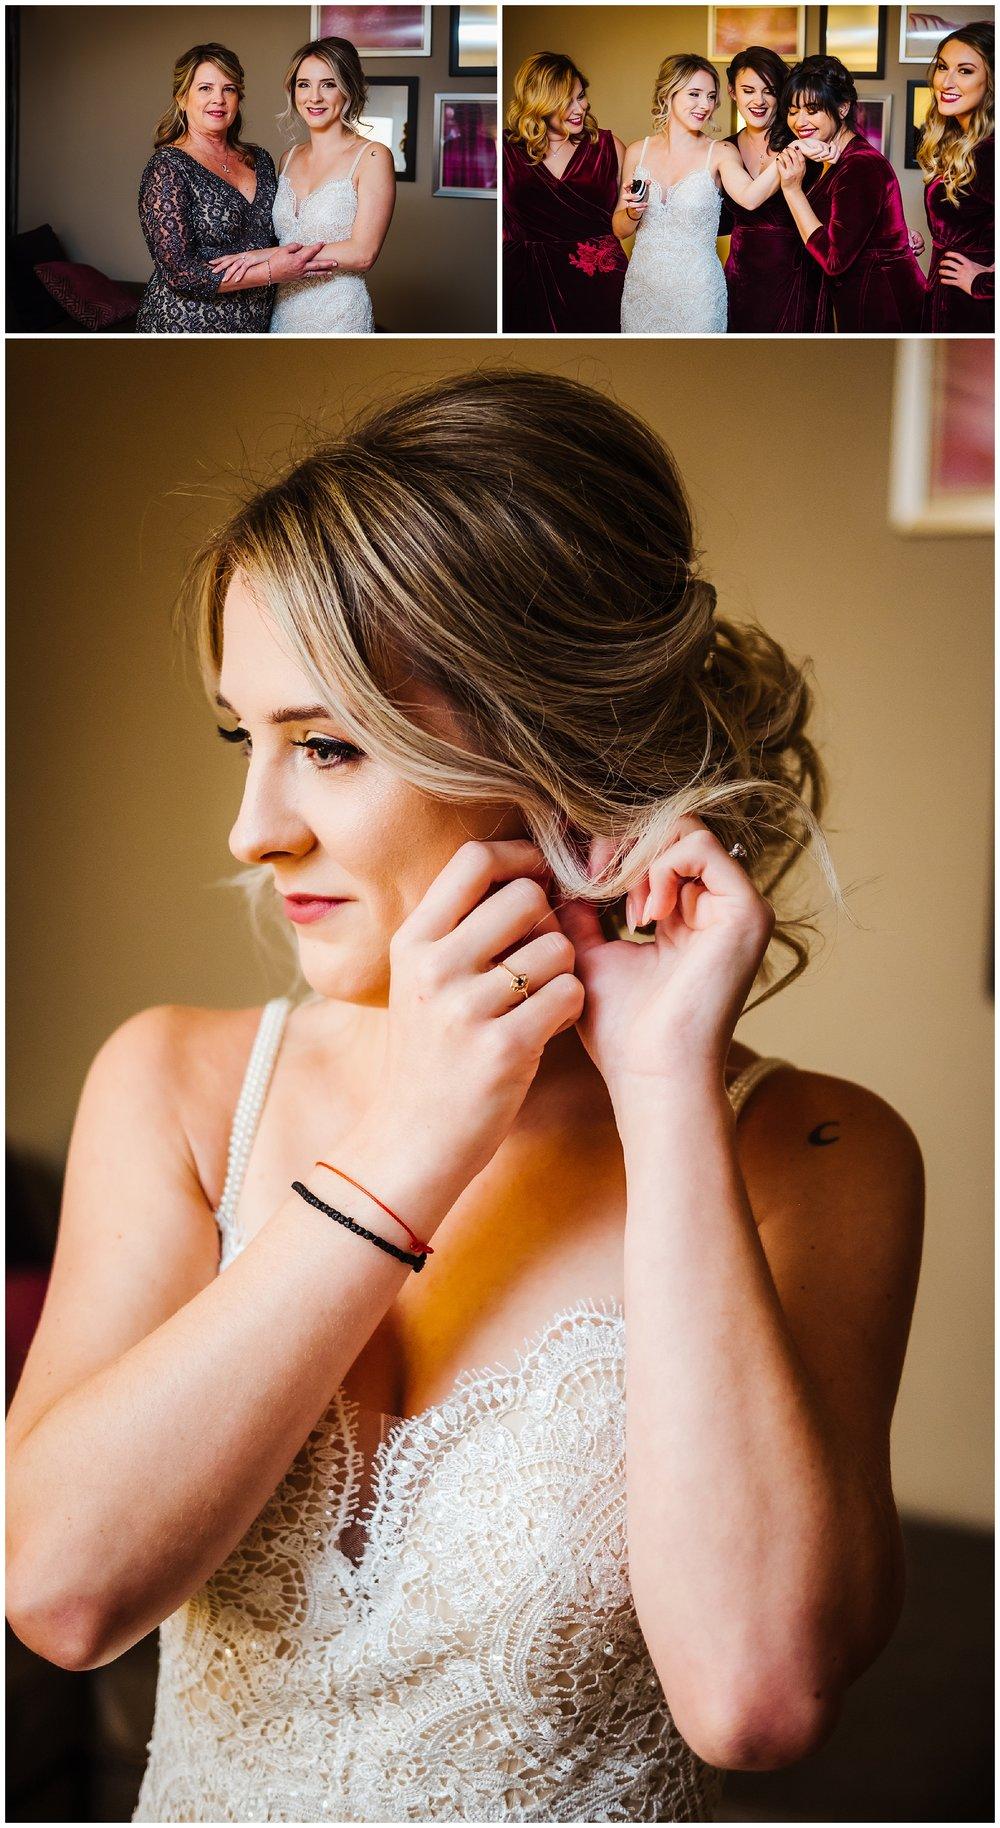 tampa-armeture-wedding-photographer-edgy-industrial-downtown-fancy-free-nursery-tattoo-burgandy-velvet_0011.jpg